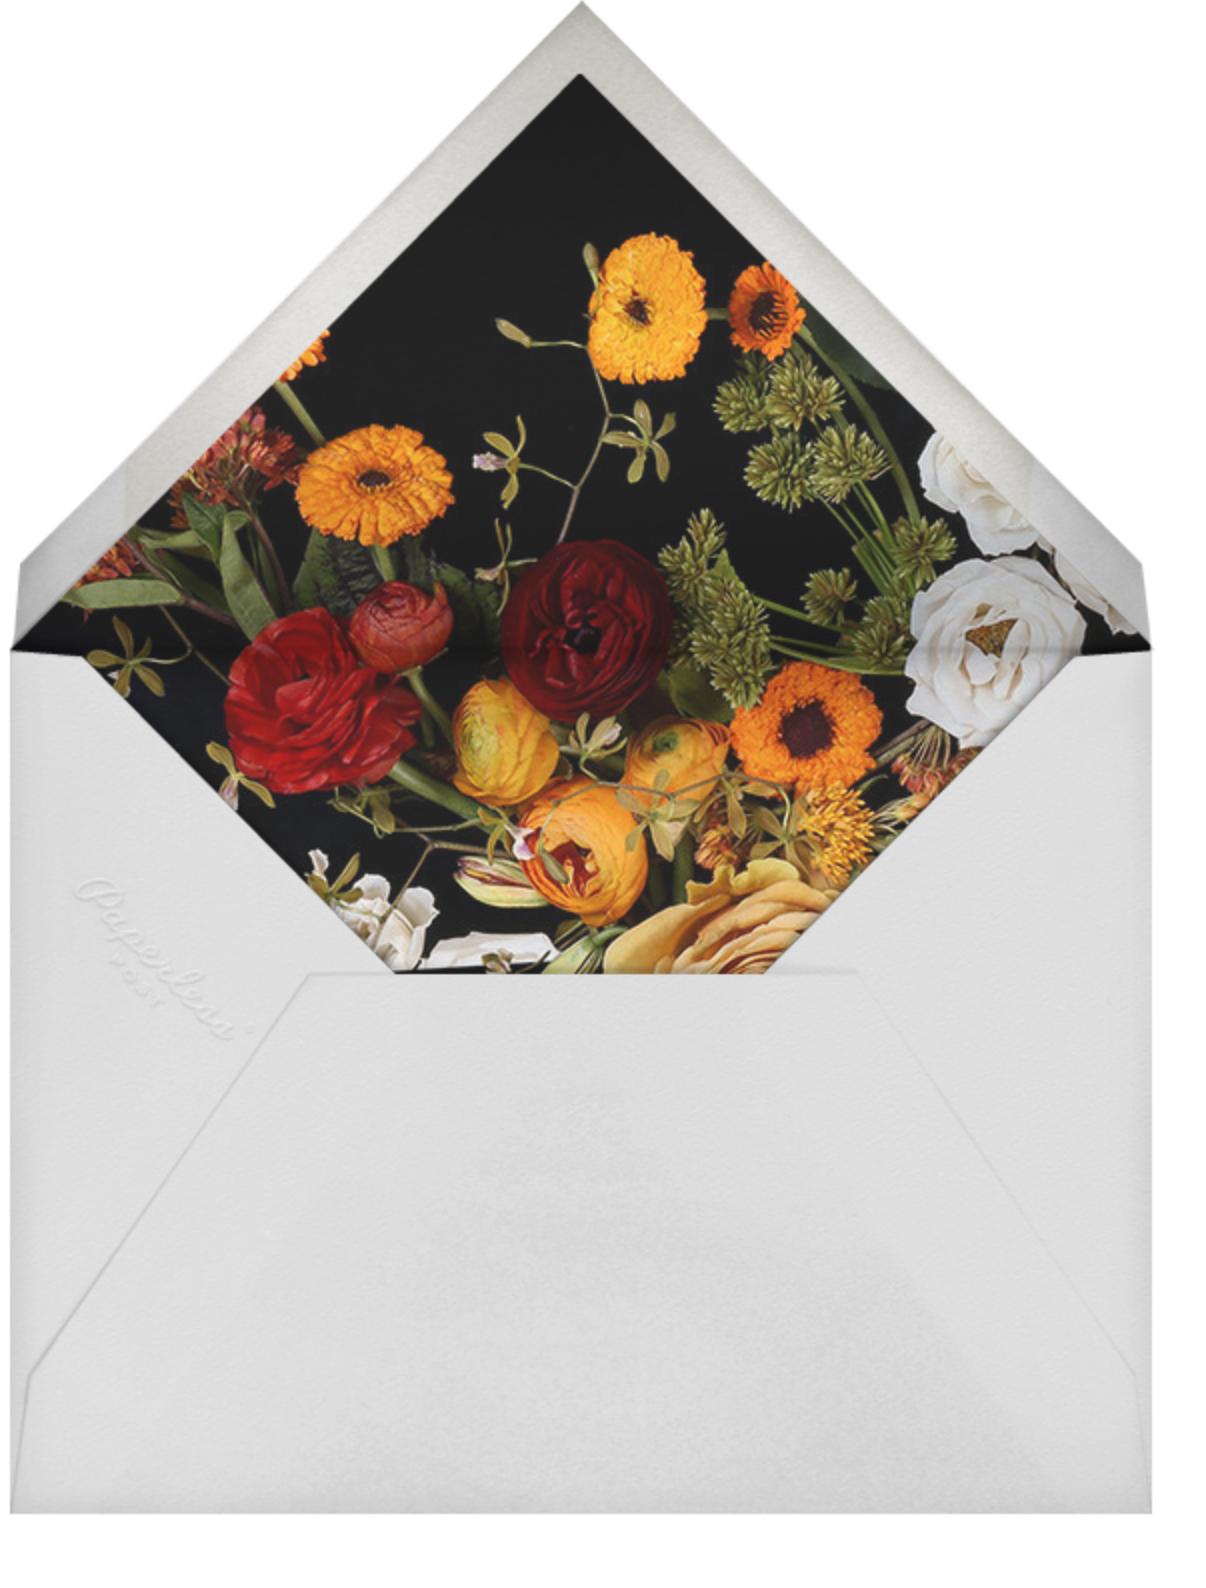 Vendémiaire (Horizontal) - Putnam & Putnam - Autumn entertaining - envelope back